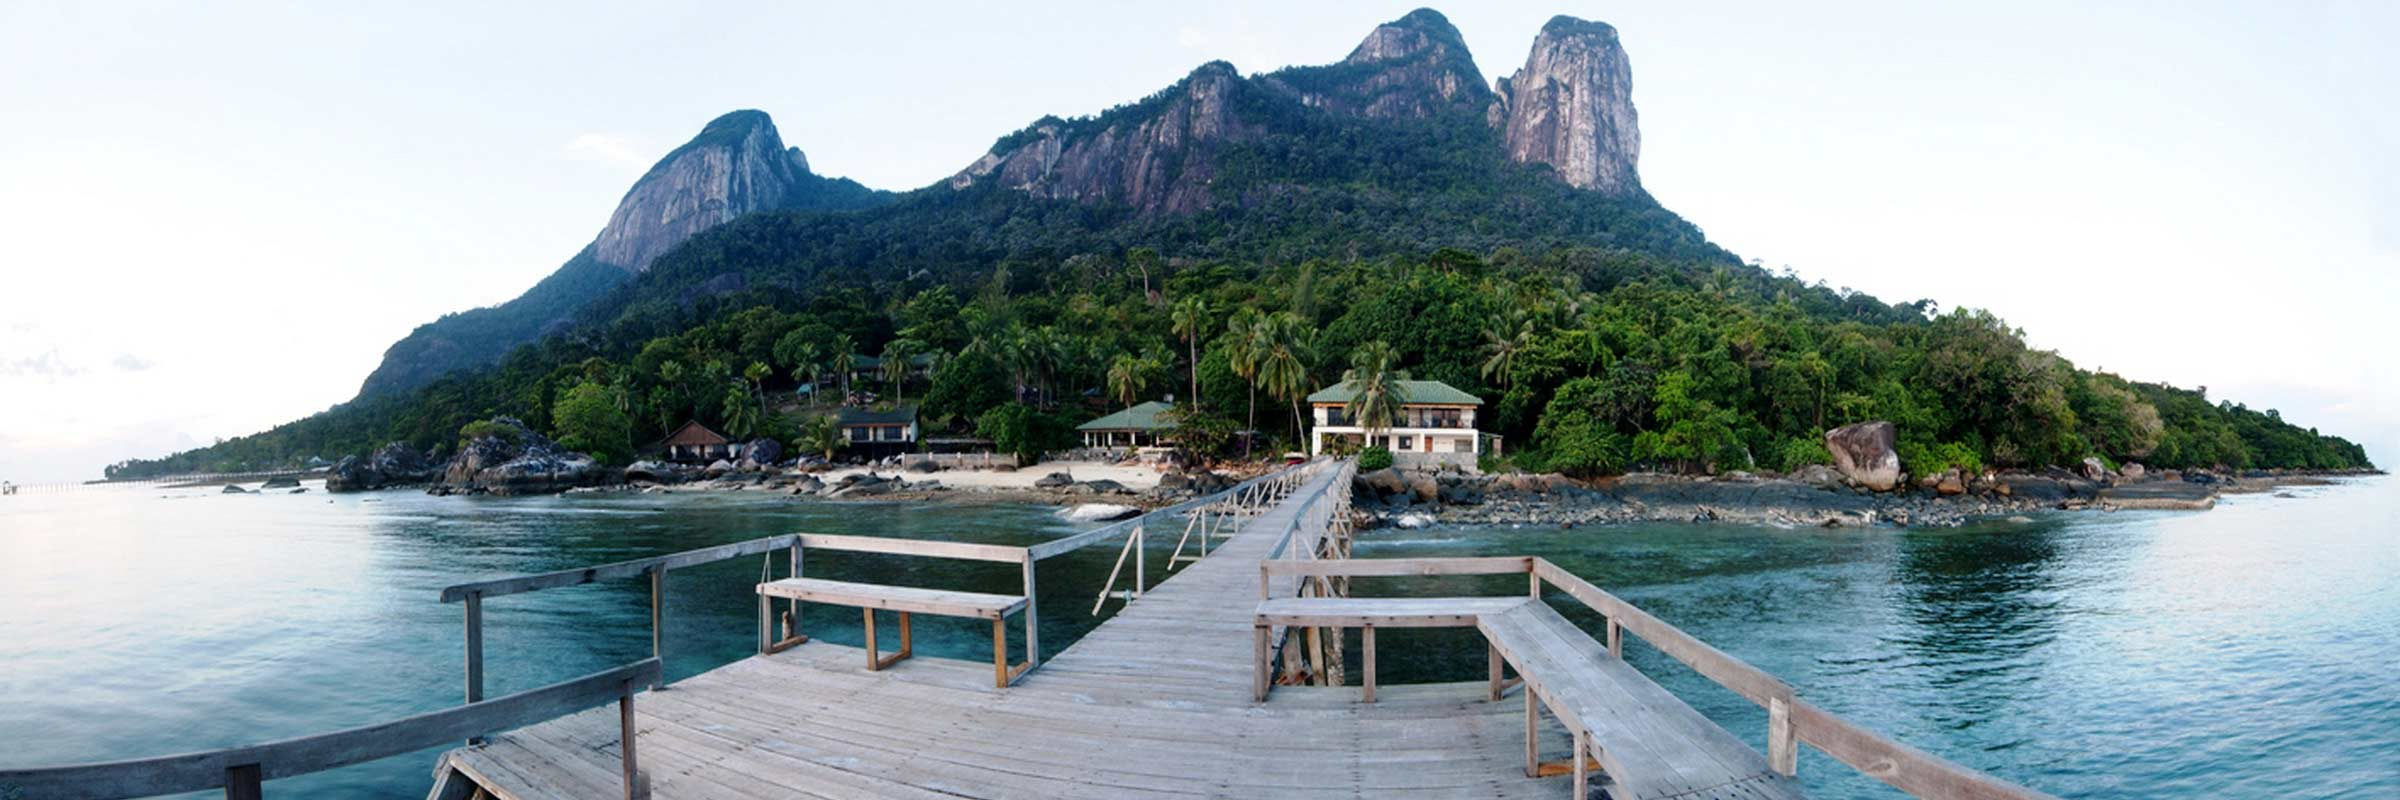 Minang Cove Resort Ansicht Steg